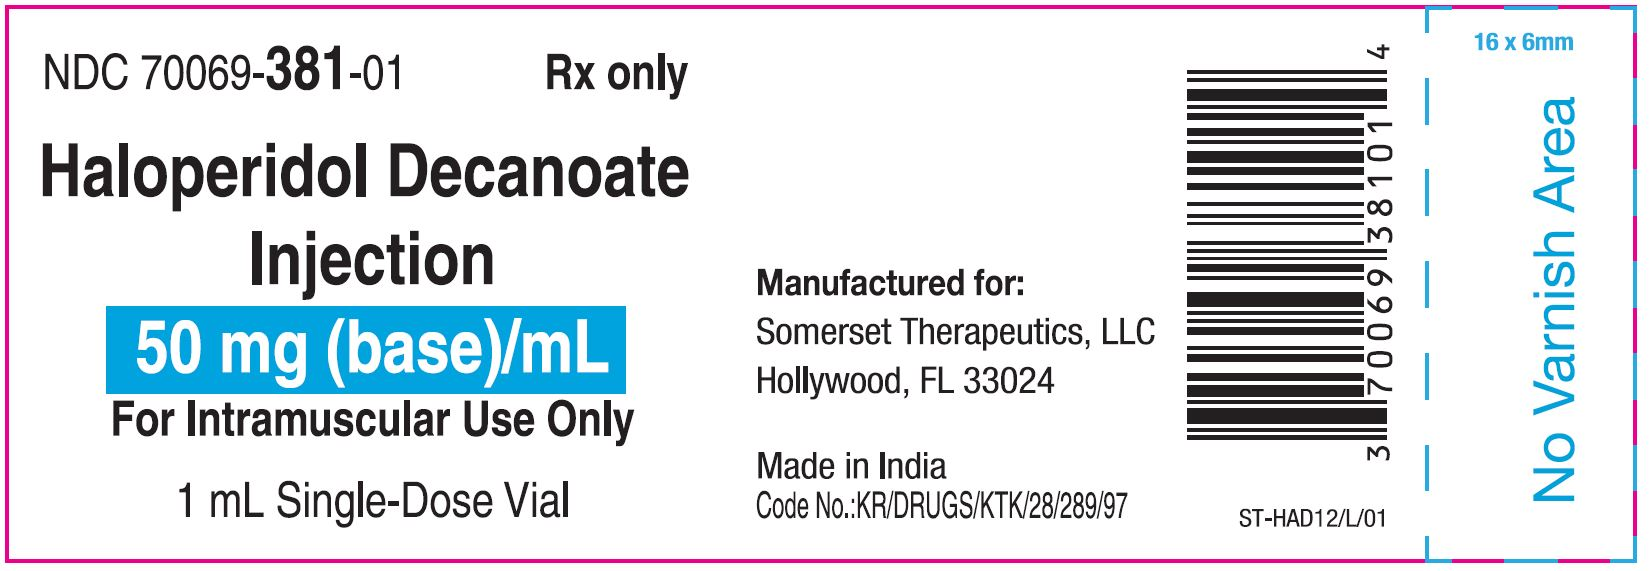 vial label 1ml